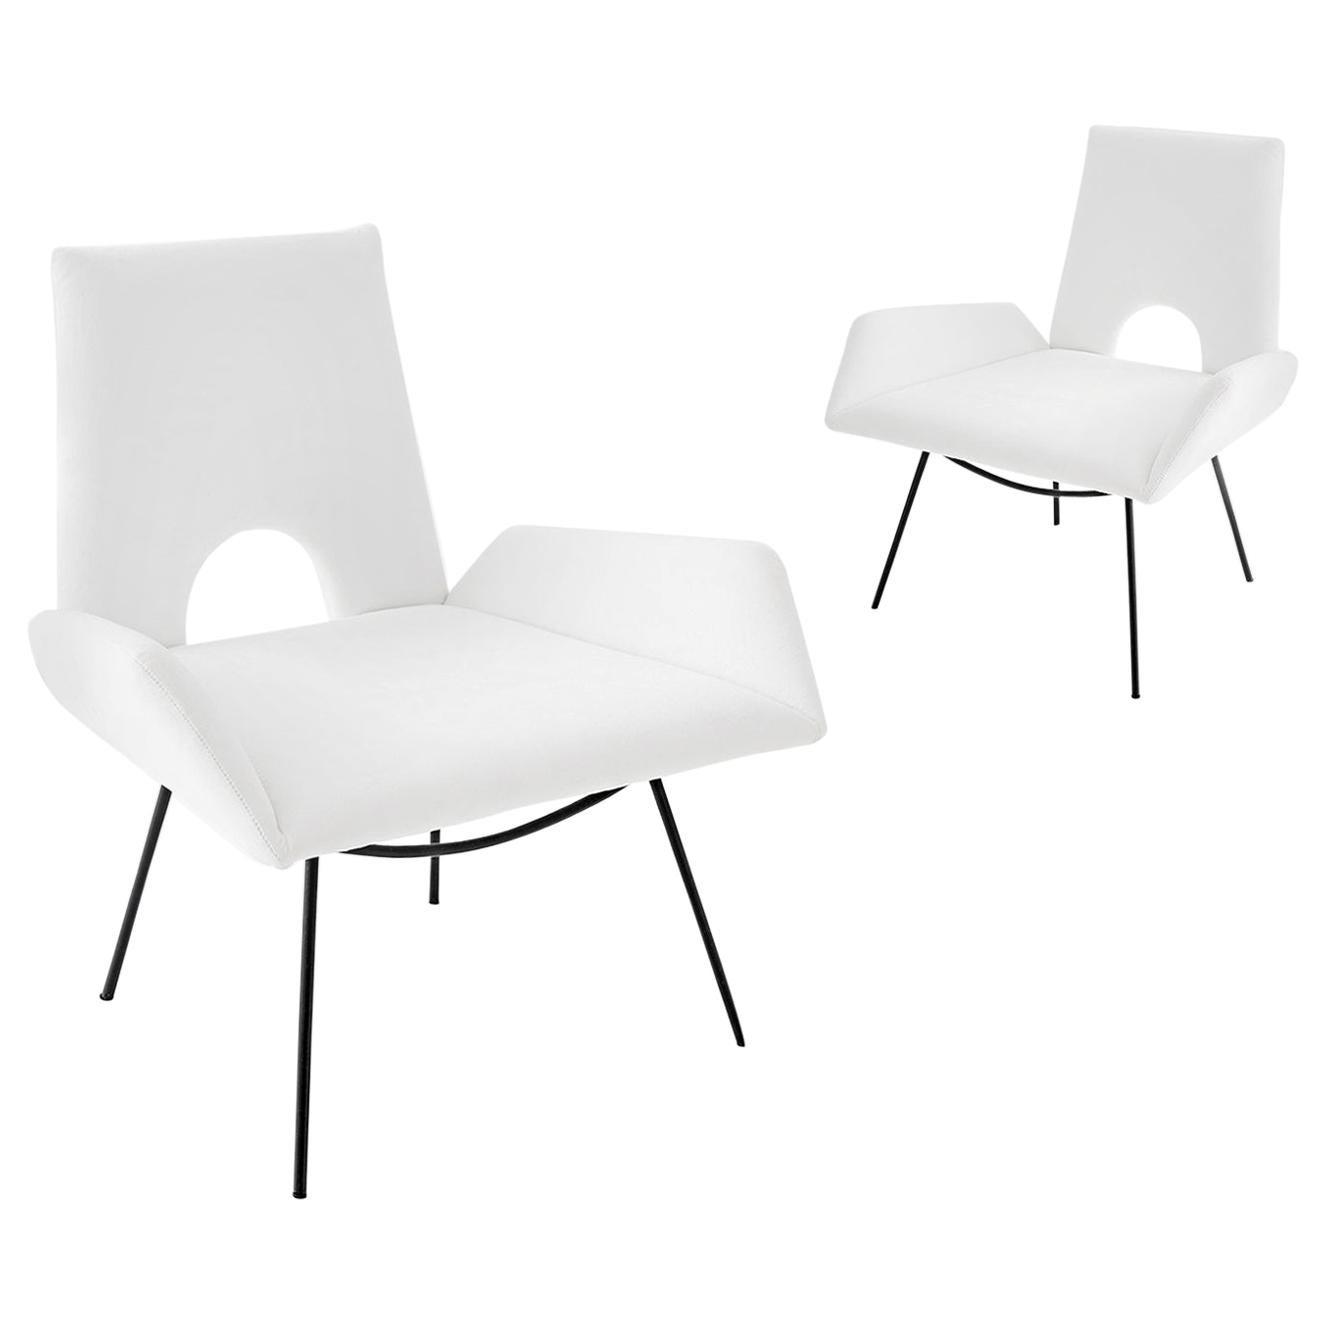 Martin Eisler & Carlo Hauner Modern Brazilian Pair of Low Armchairs White Fabric